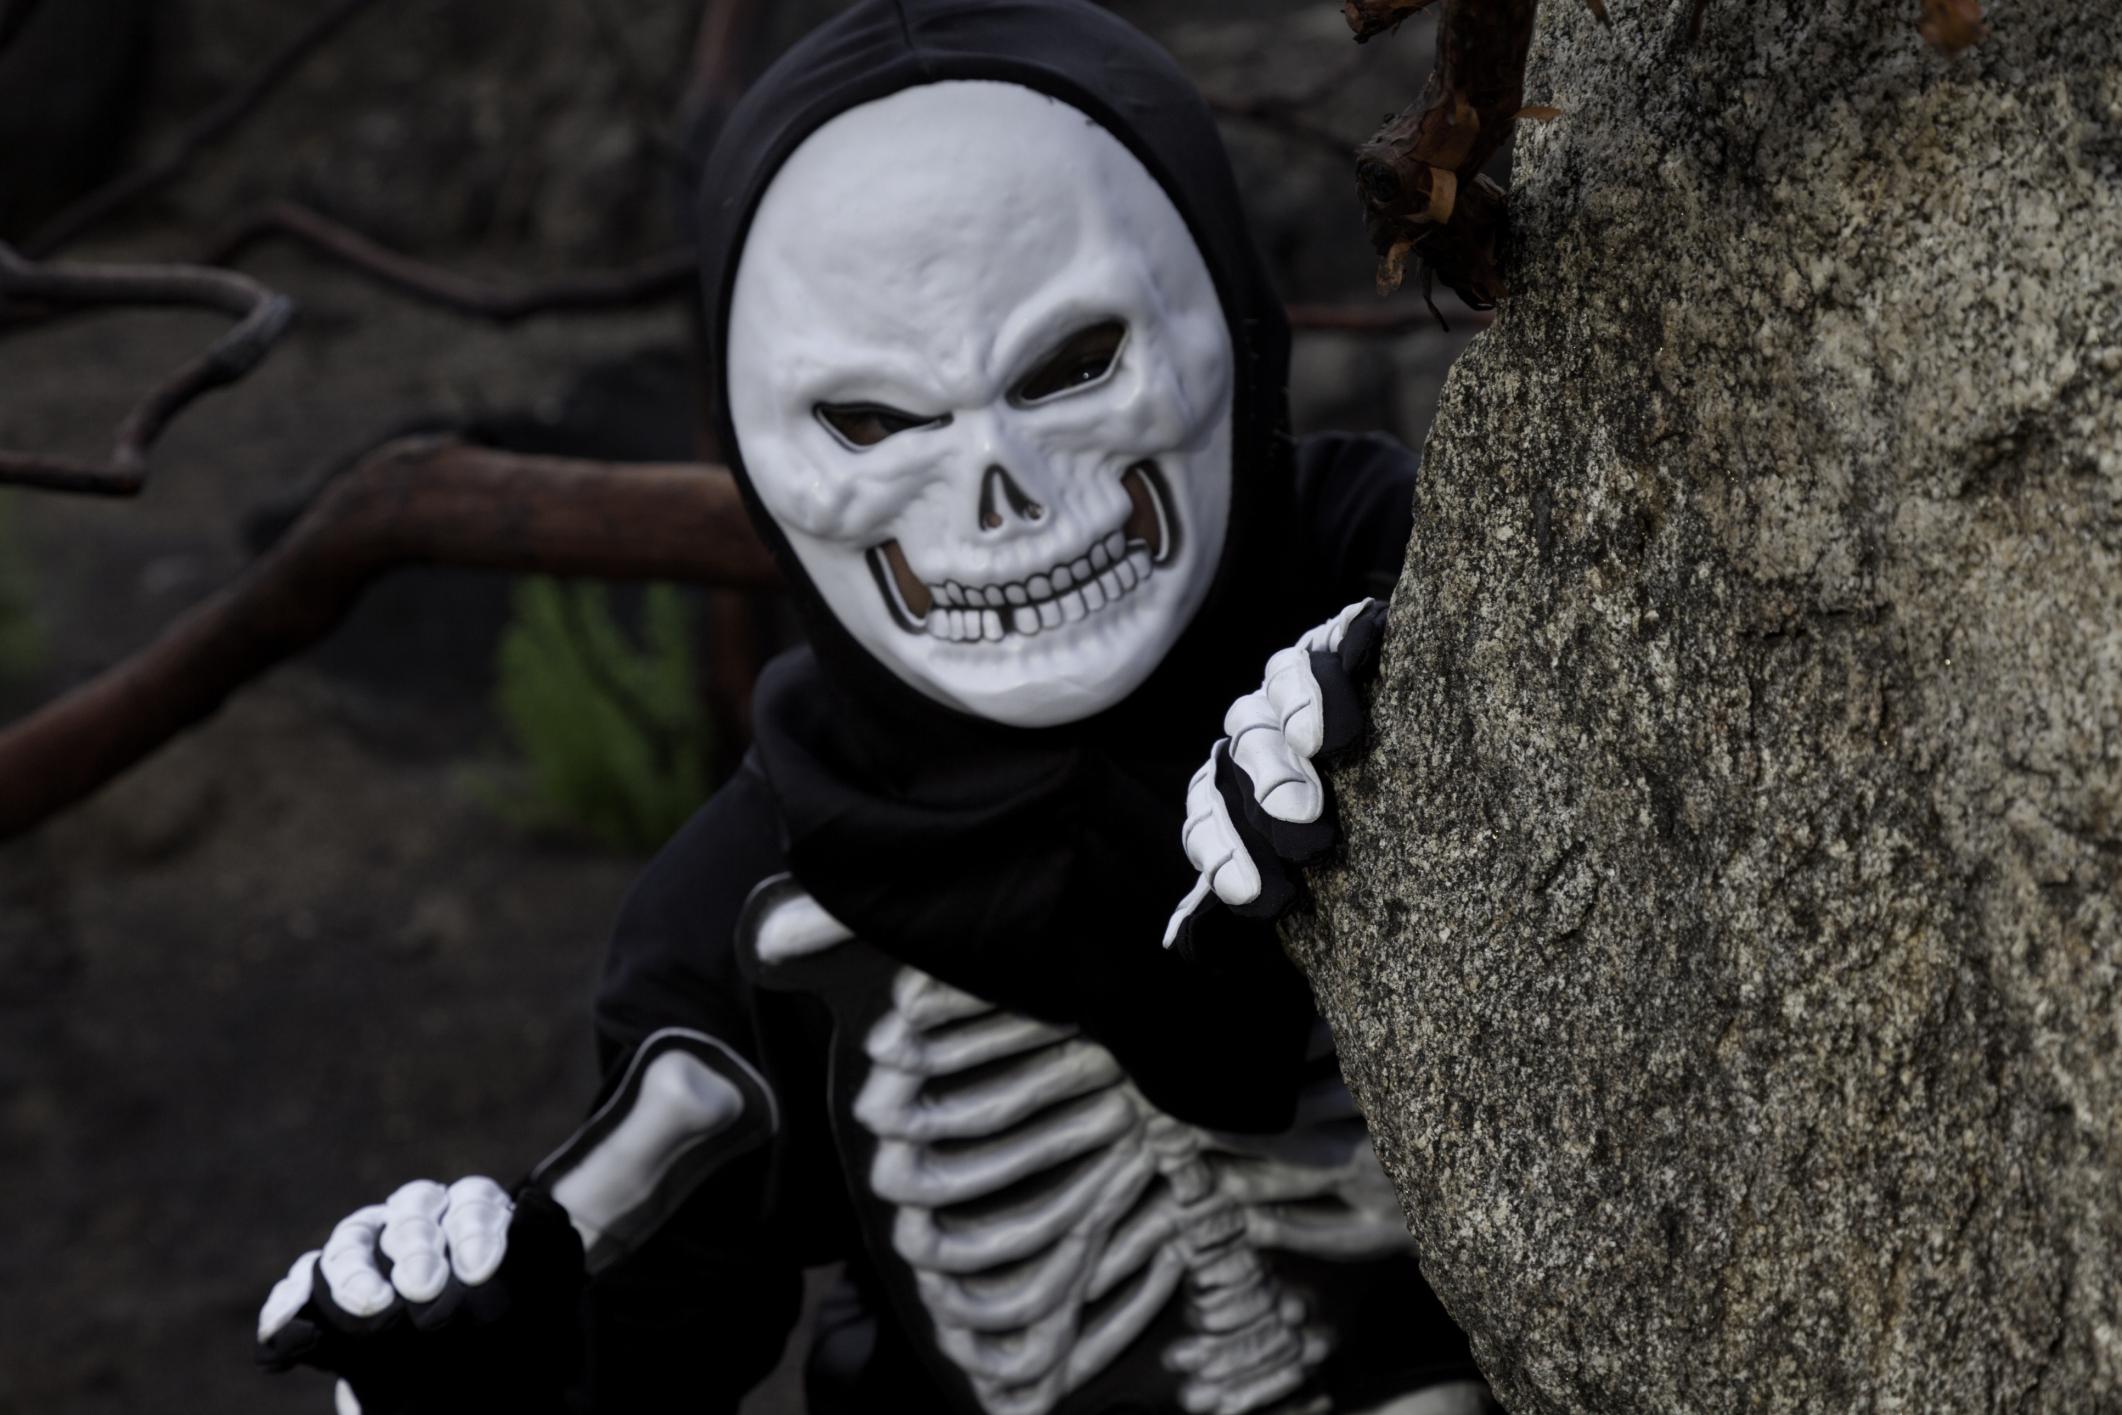 Boy dressed as skeleton.